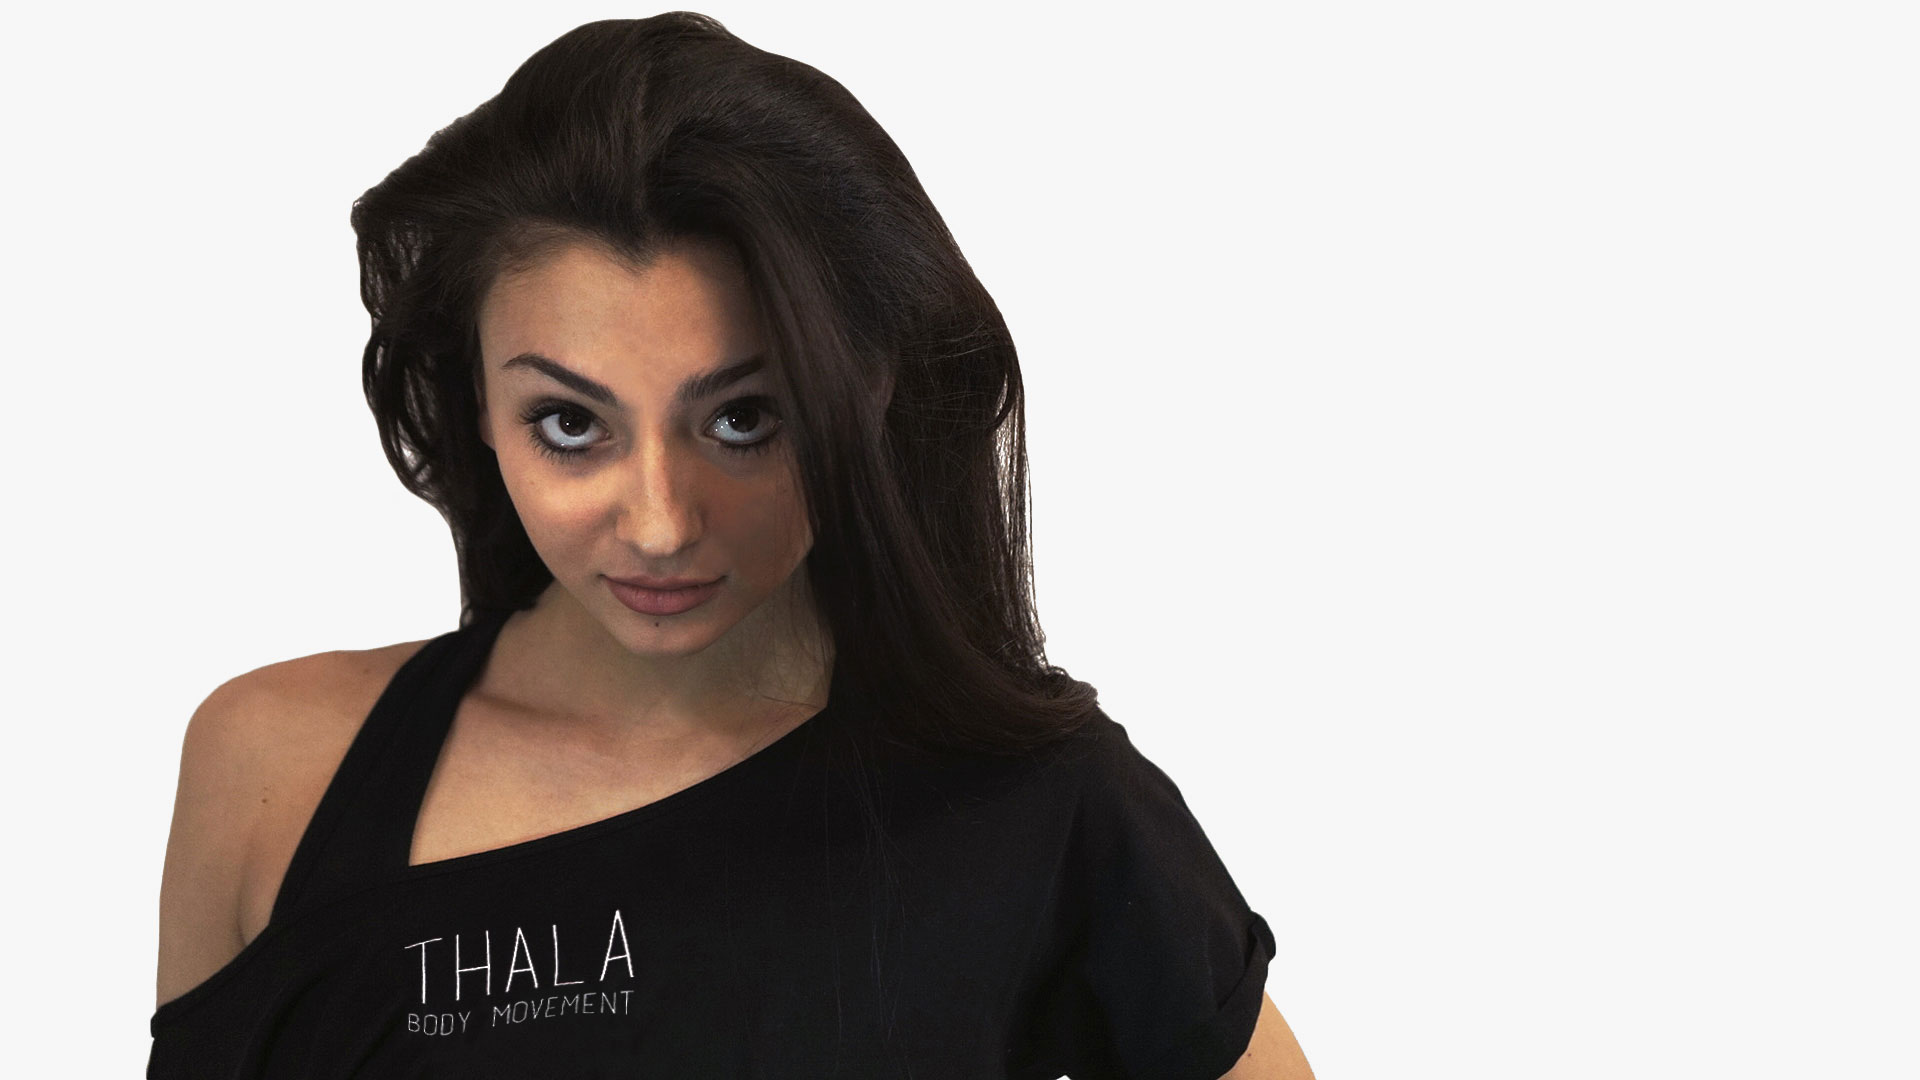 Thala wear riccardo bernucci fotografia